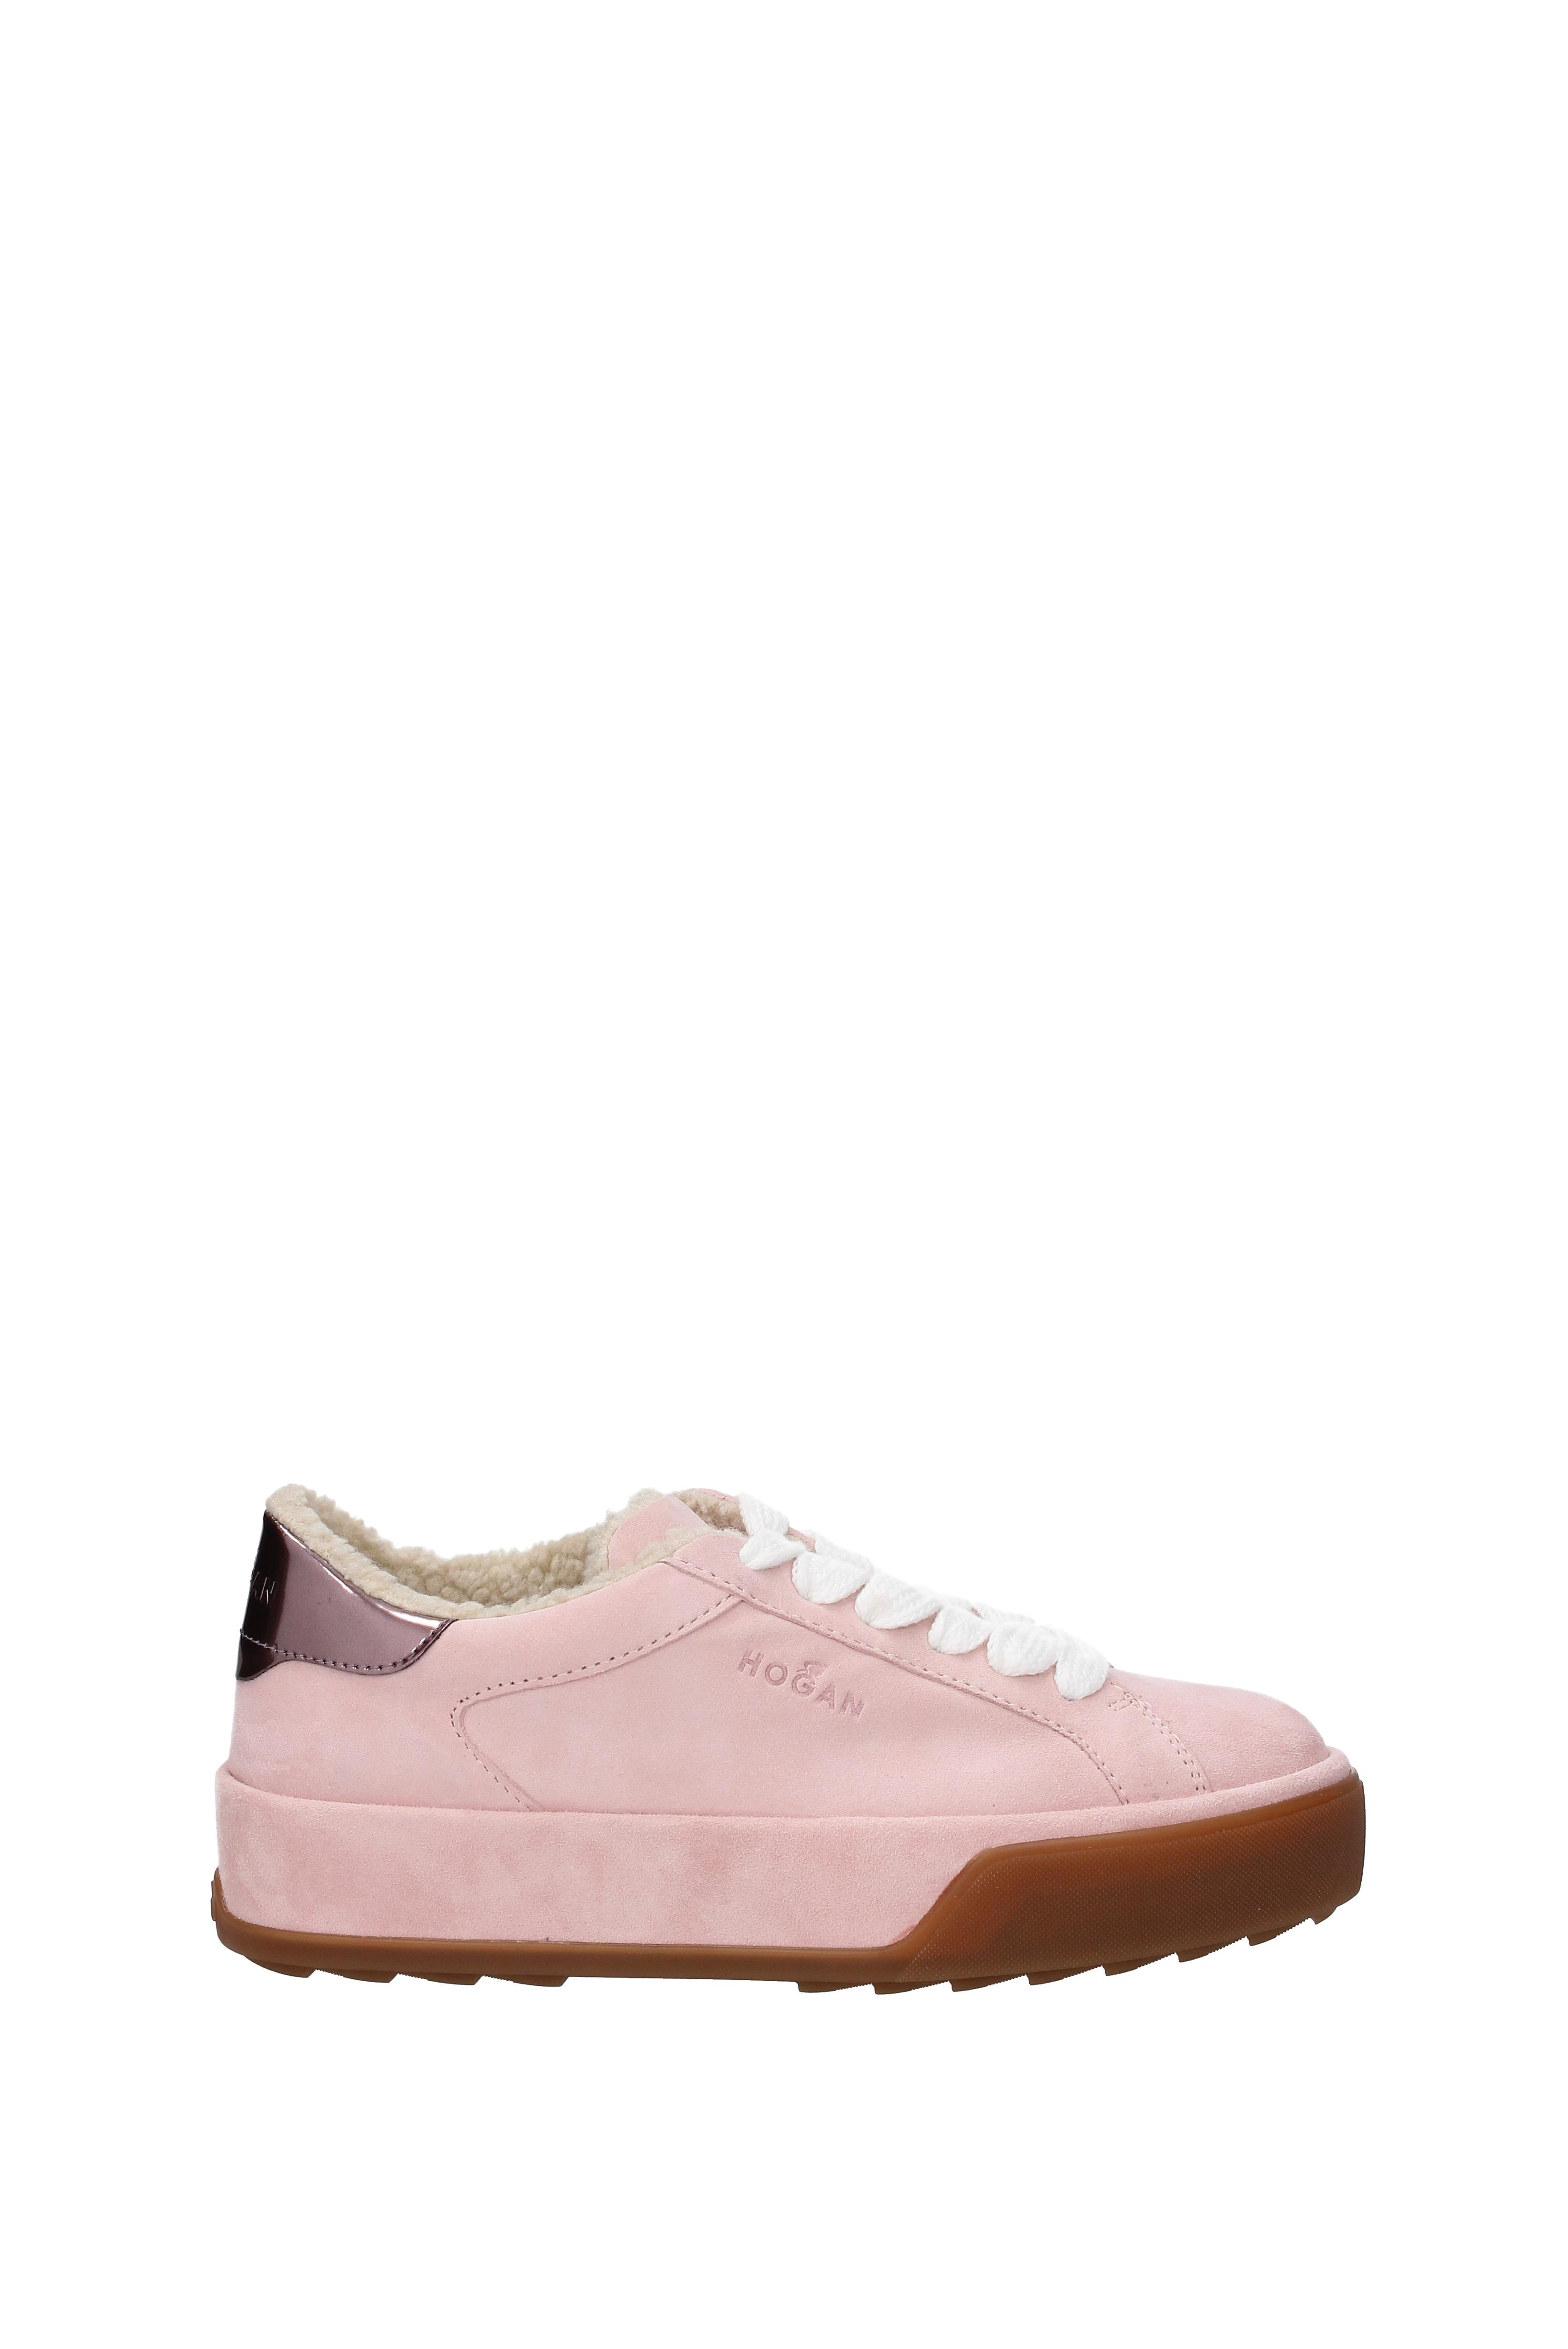 Alta qualit Sneakers Hogan Donna Camoscio HXW3200J4301SG vendita